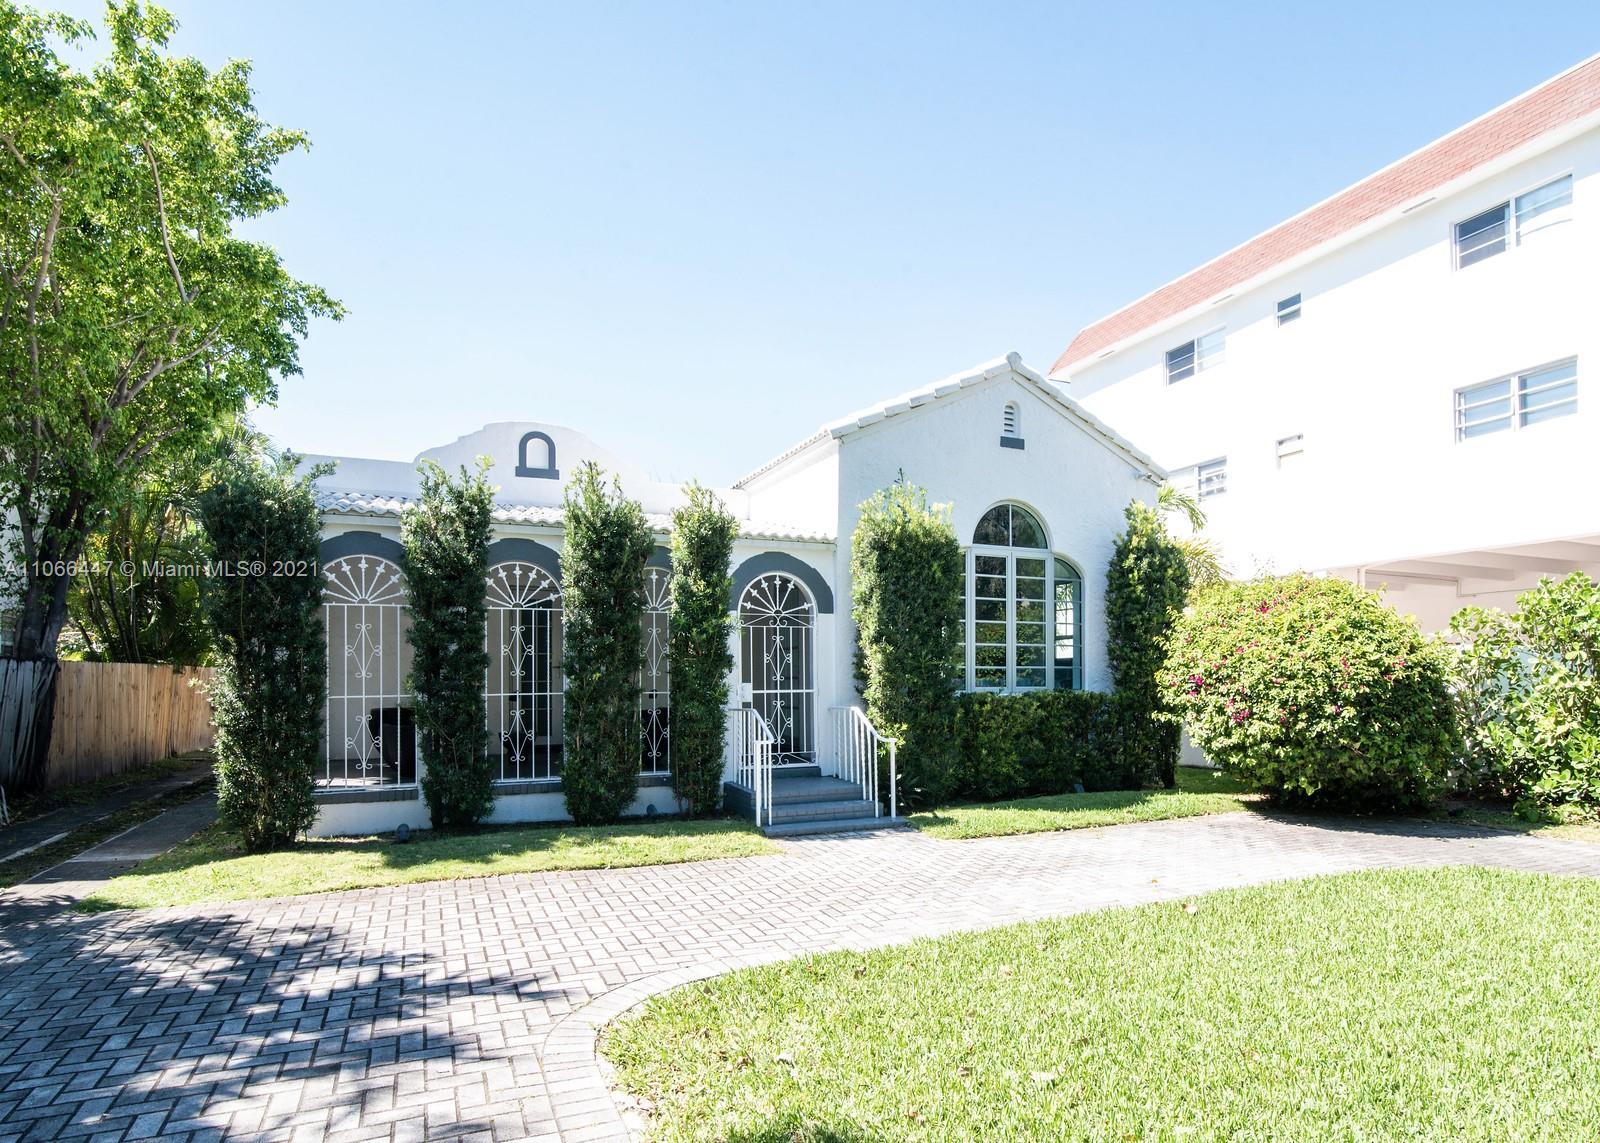 1836  Jefferson Ave  For Sale A11066447, FL